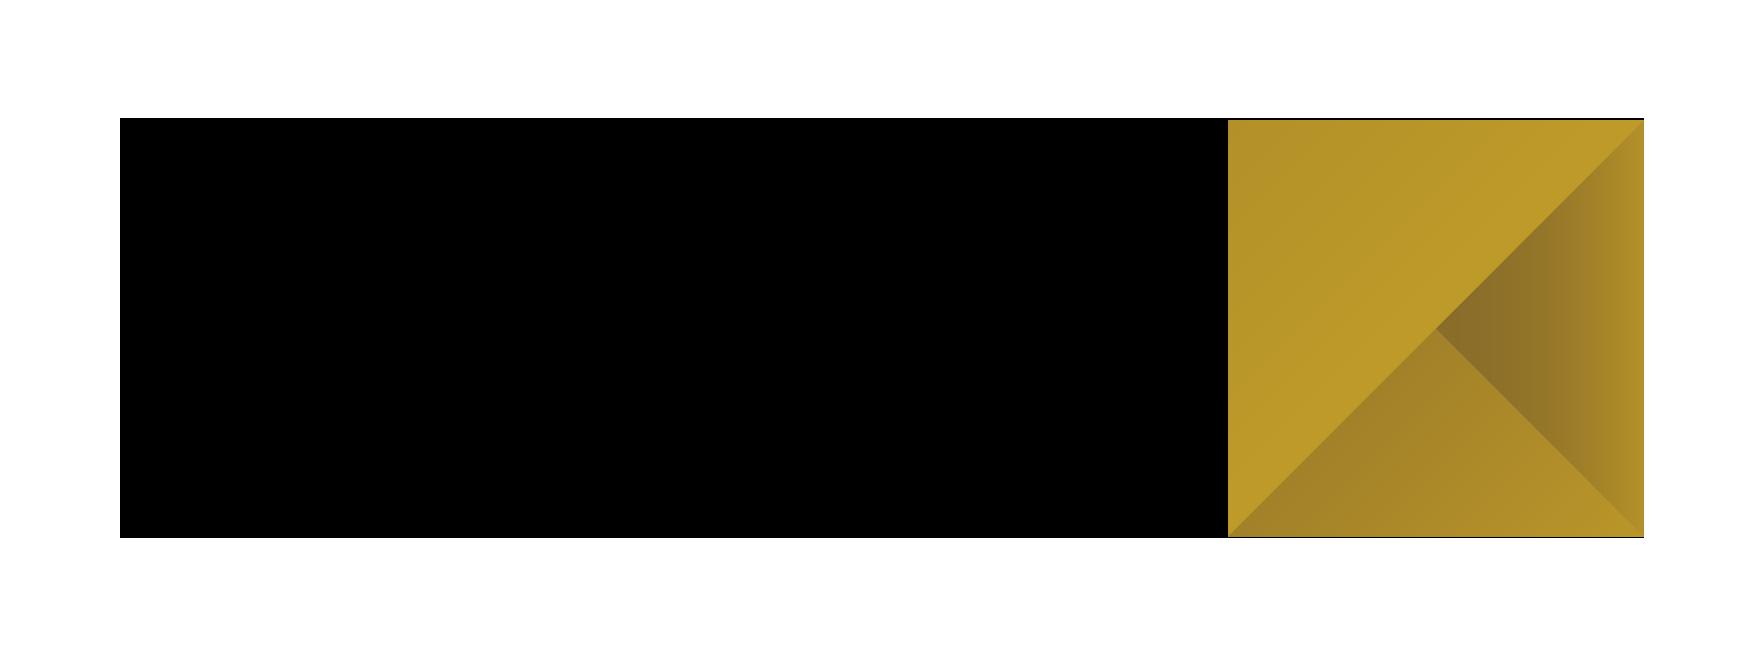 artKYOTO 2020